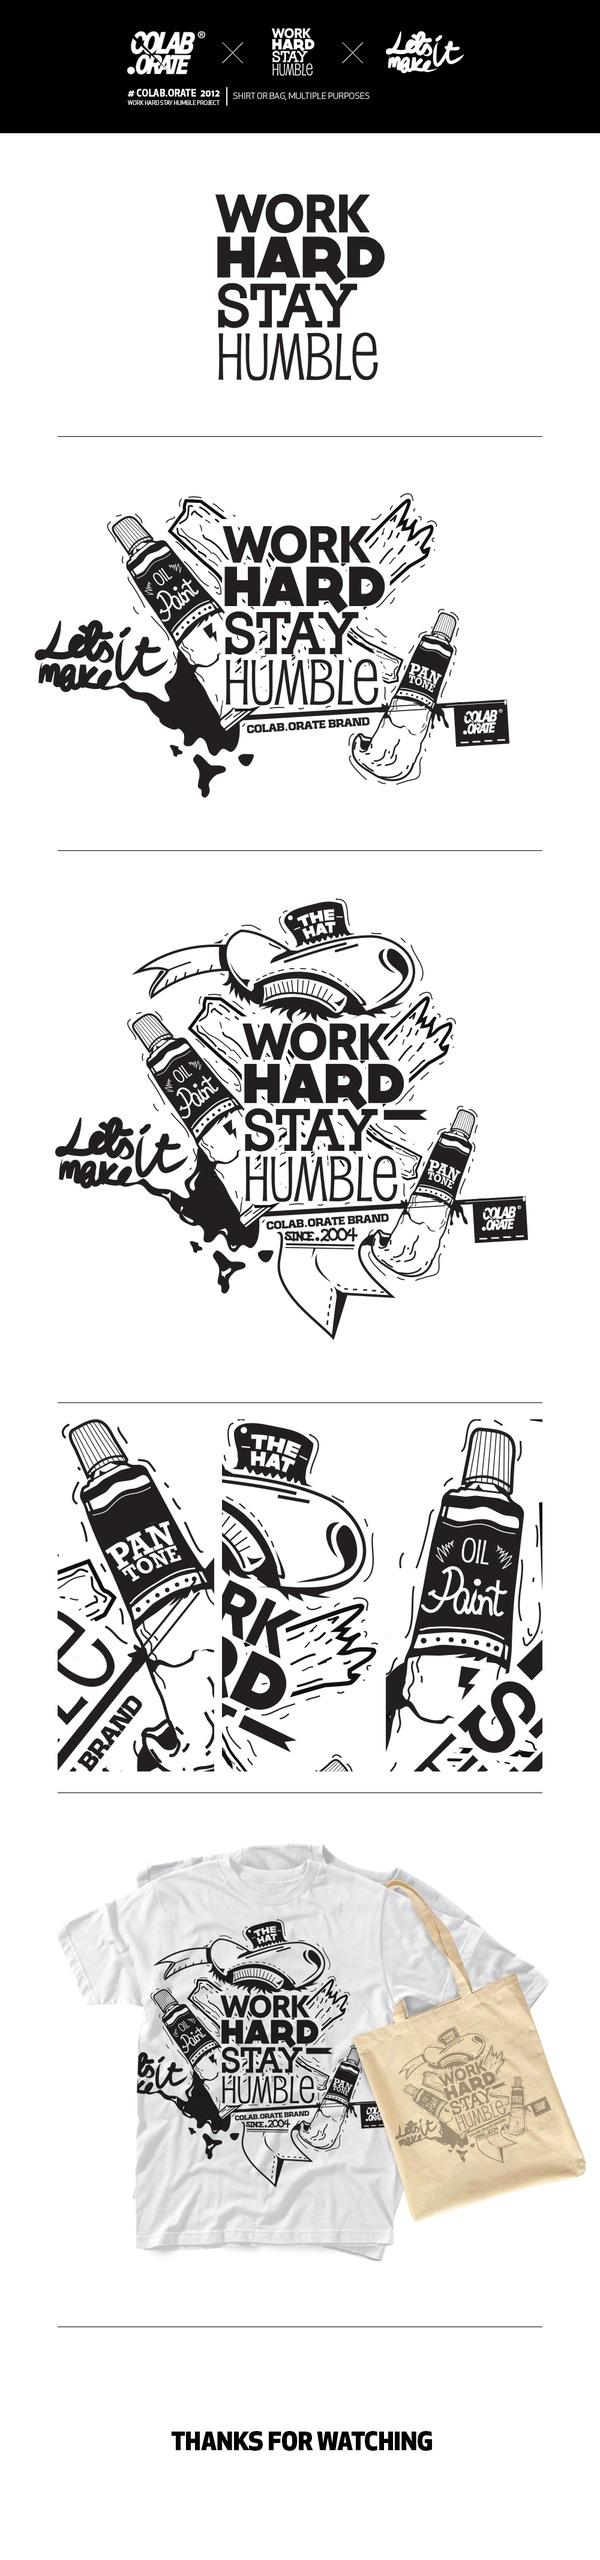 # WORK HARD STAY HUMBLE by Grzegorz Rauch, via Behance